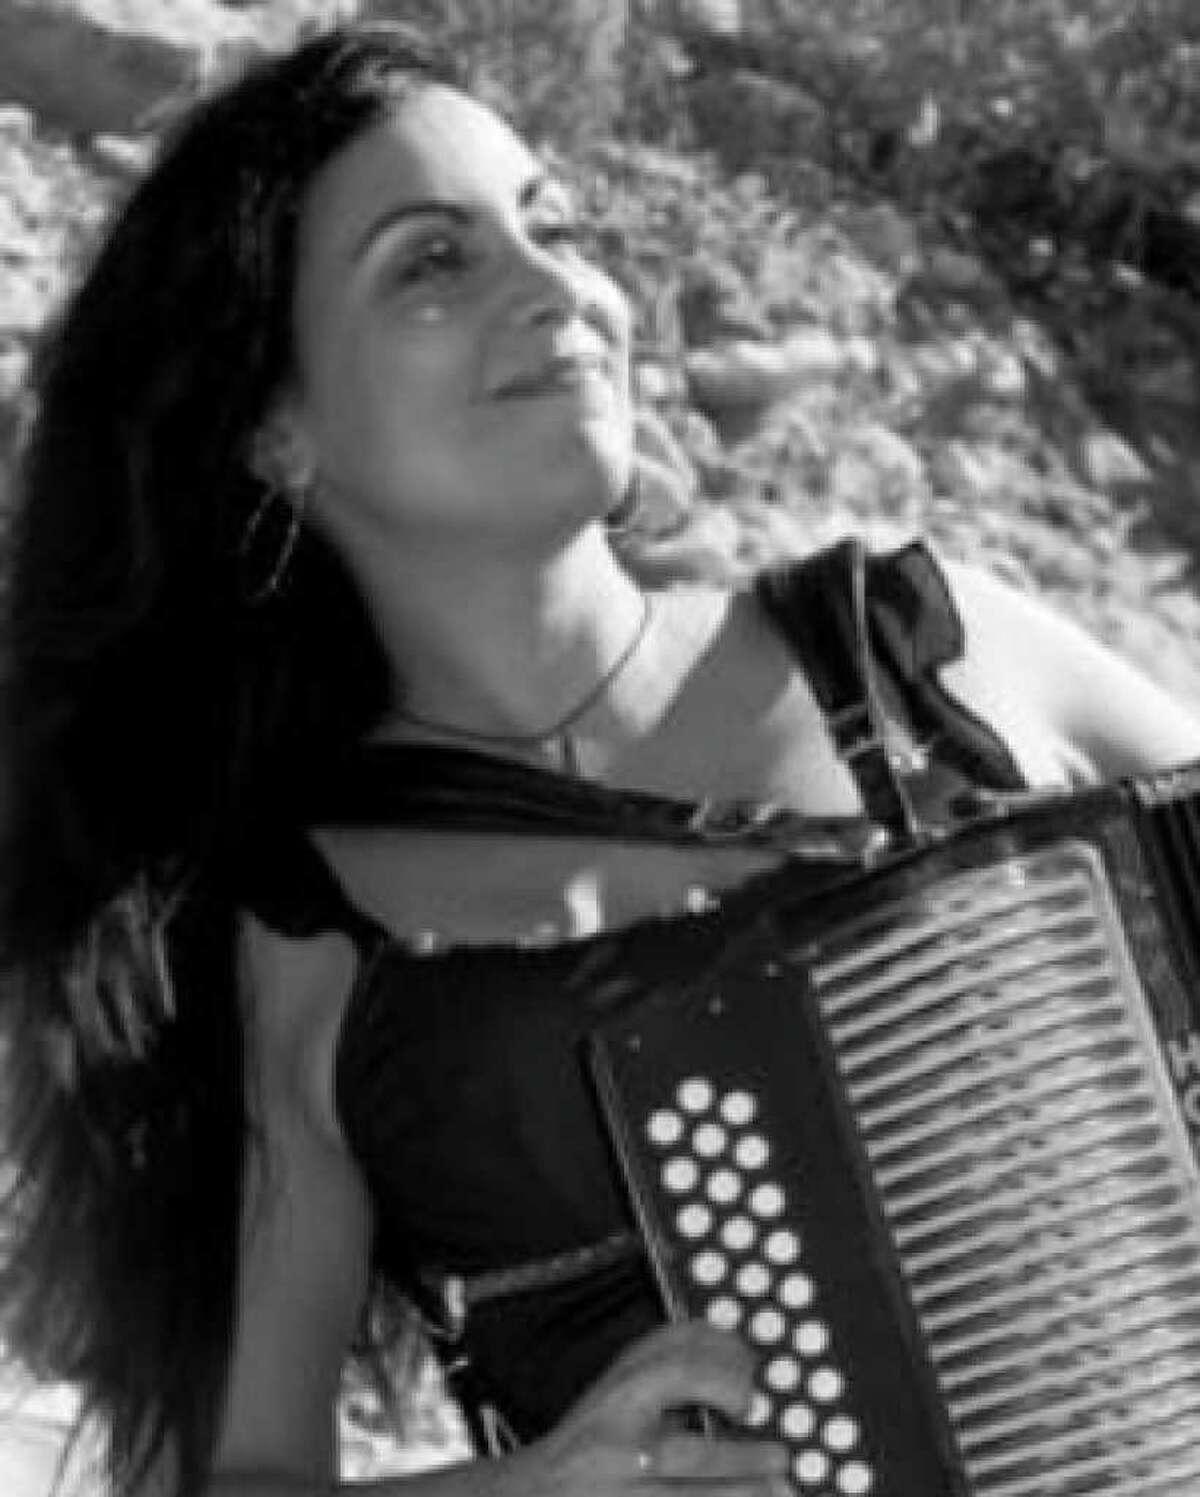 Accordionist Tara Linda plays Casbeers at the Church Friday.